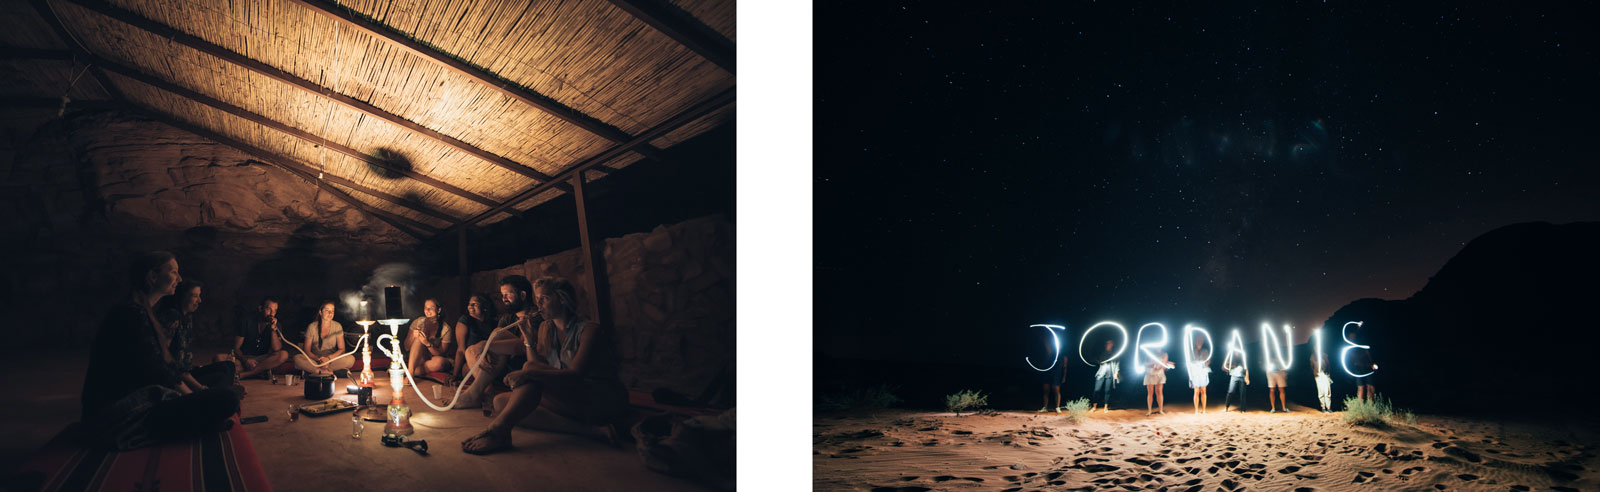 nuit désert jordanie